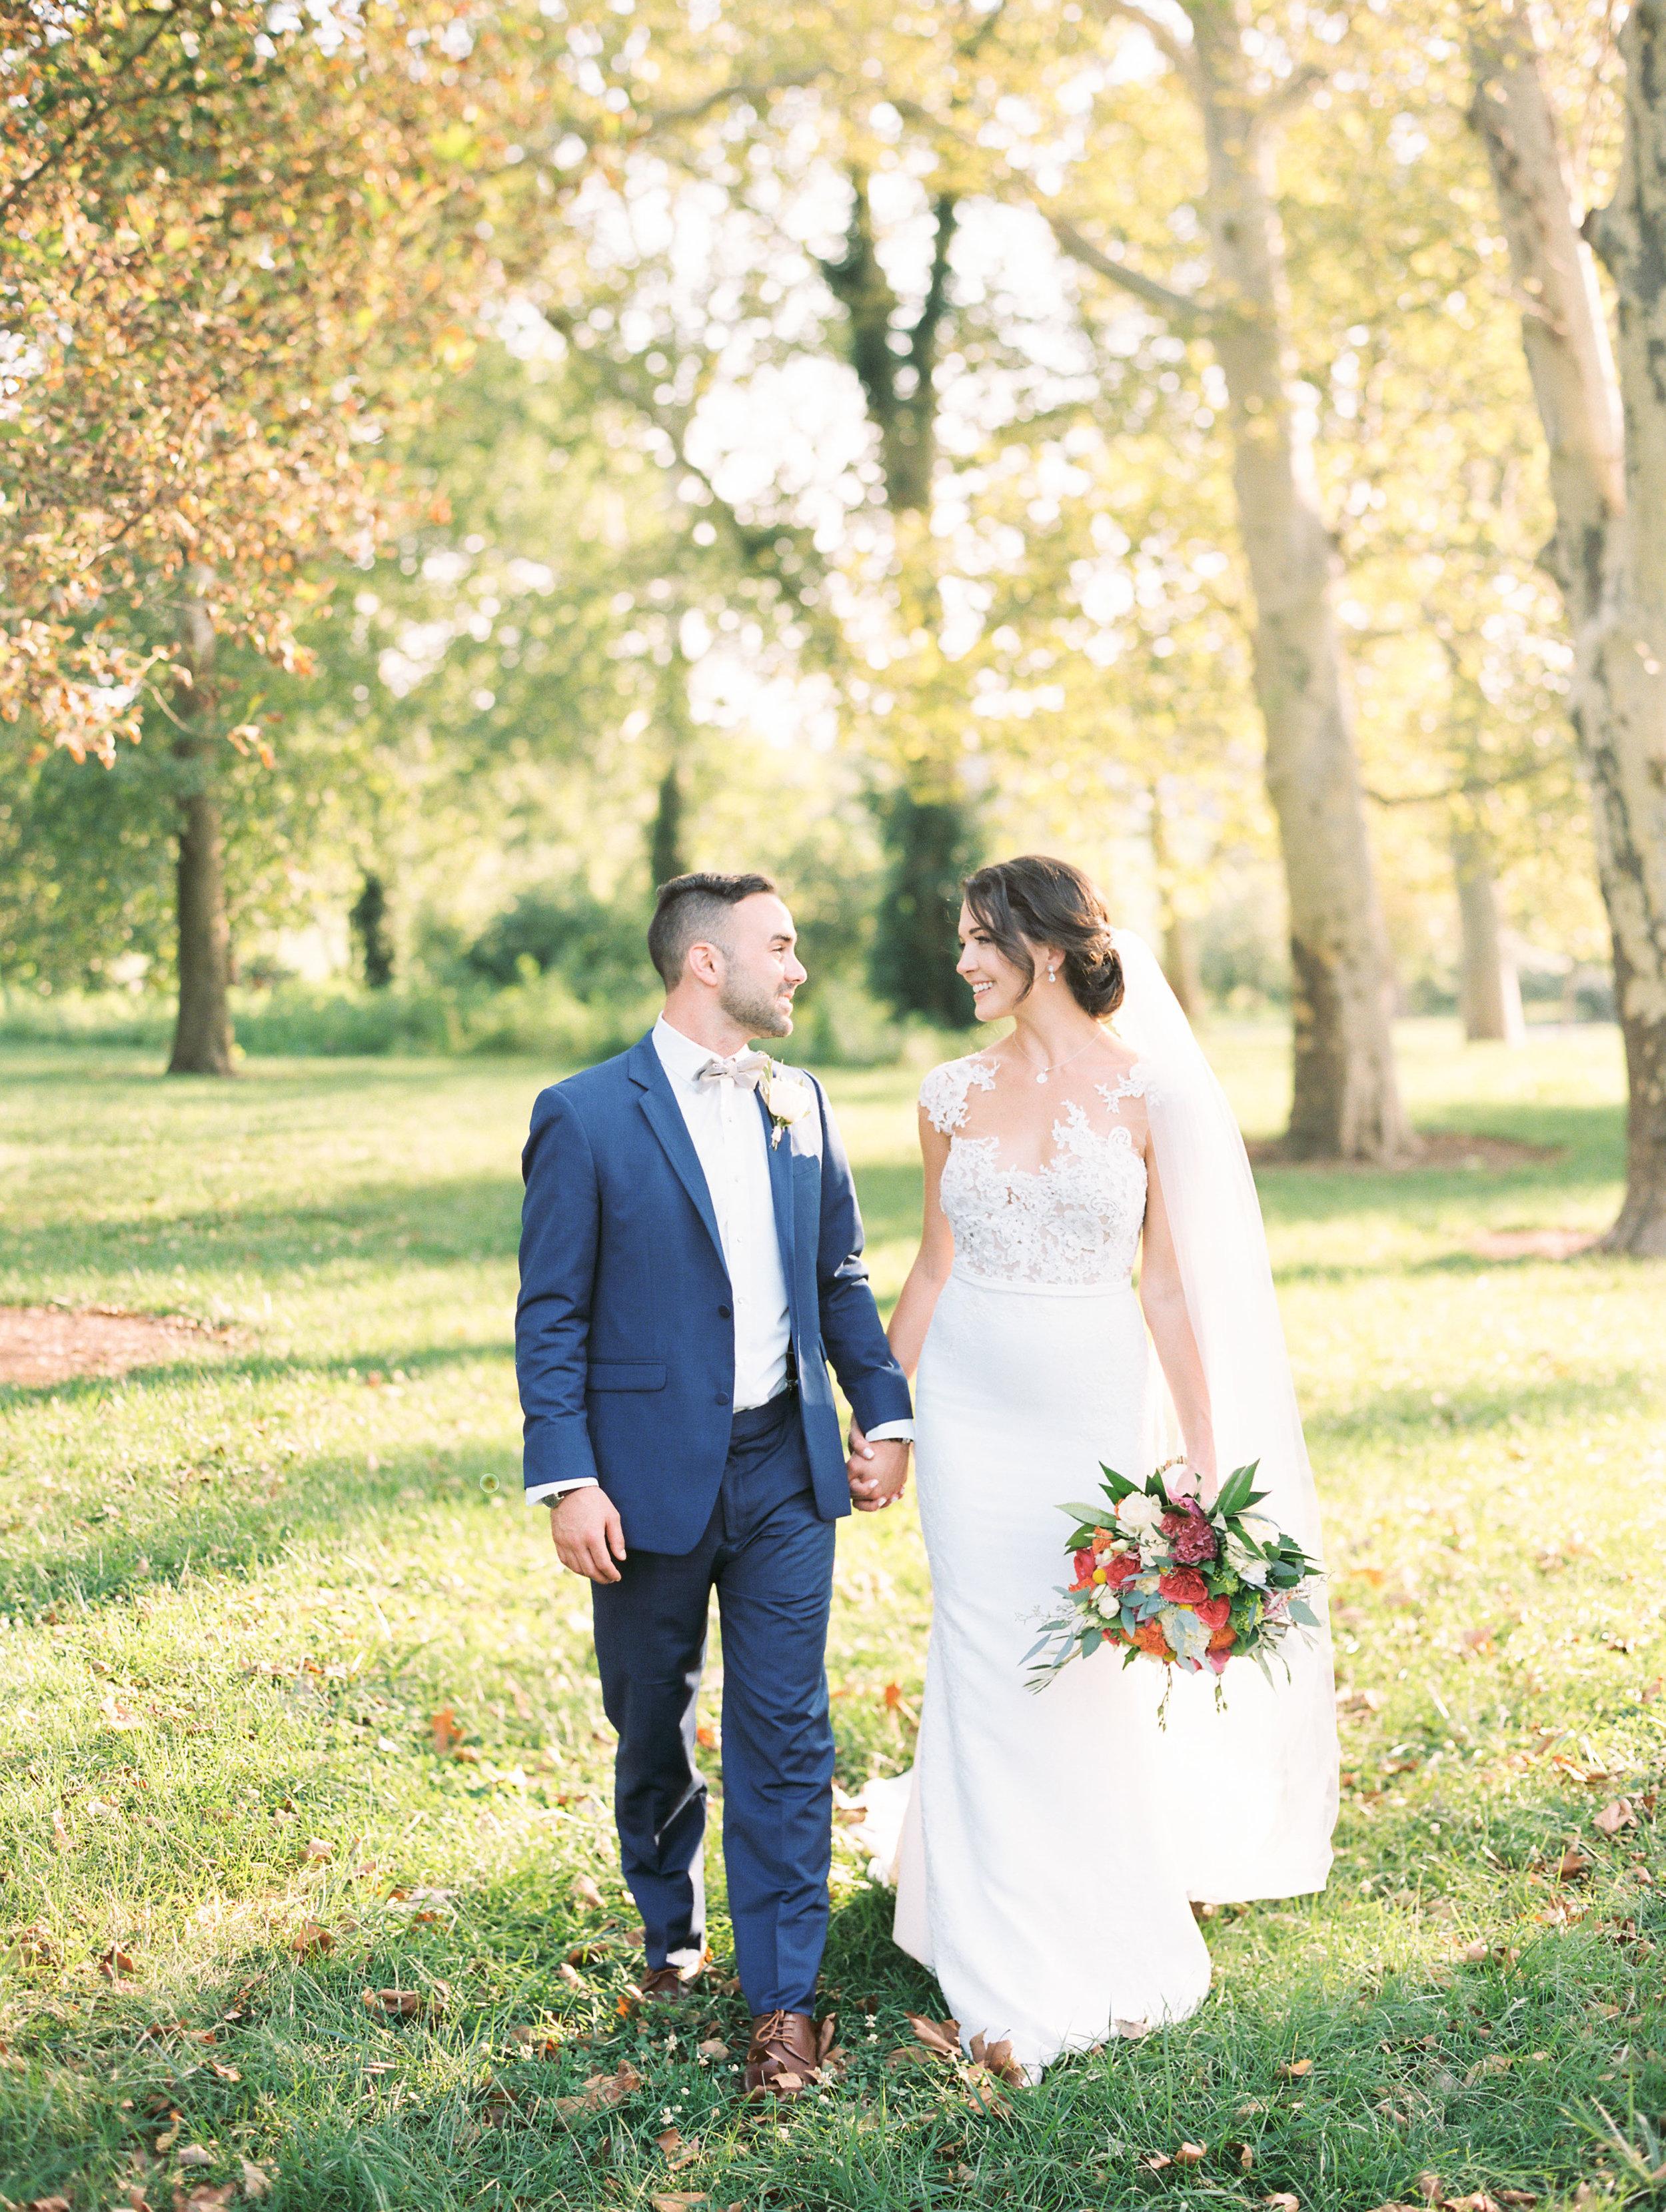 bf474792 Blog — Bay Area Wedding Photographer | Carretto Studio Photography ...